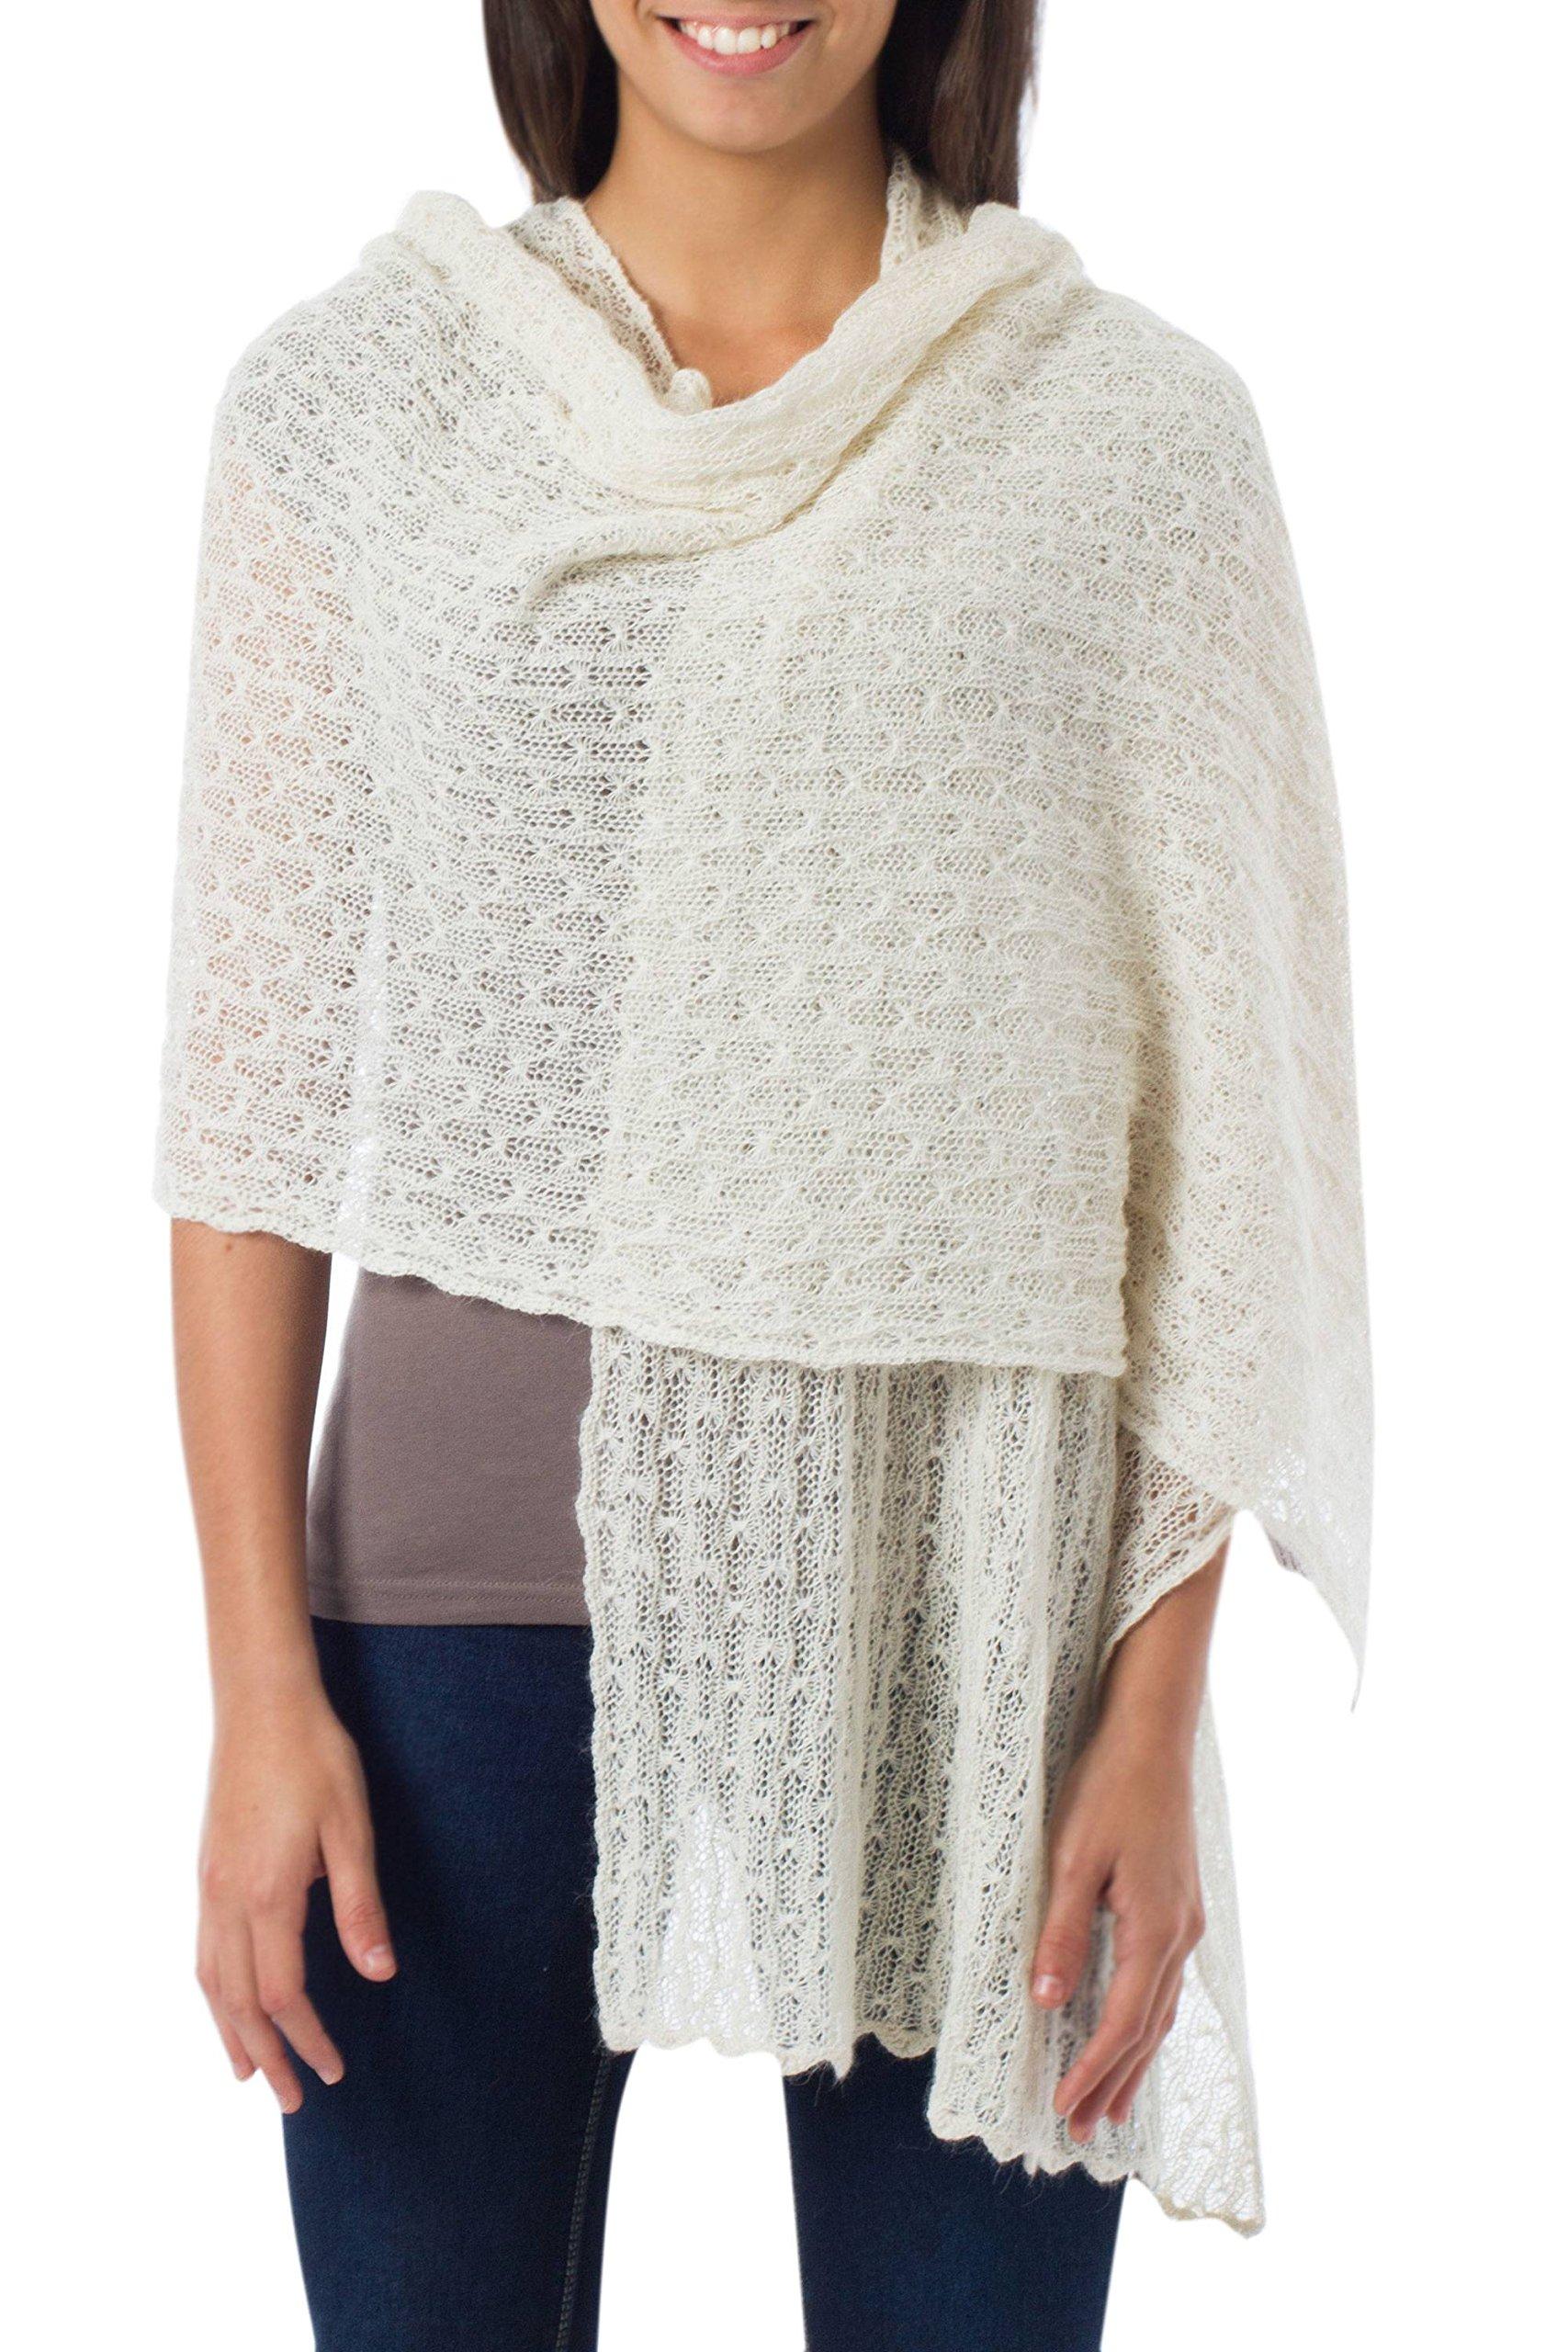 NOVICA White Baby Alpaca Wool Blend White Knit Shawl Wrap, 'Muse'